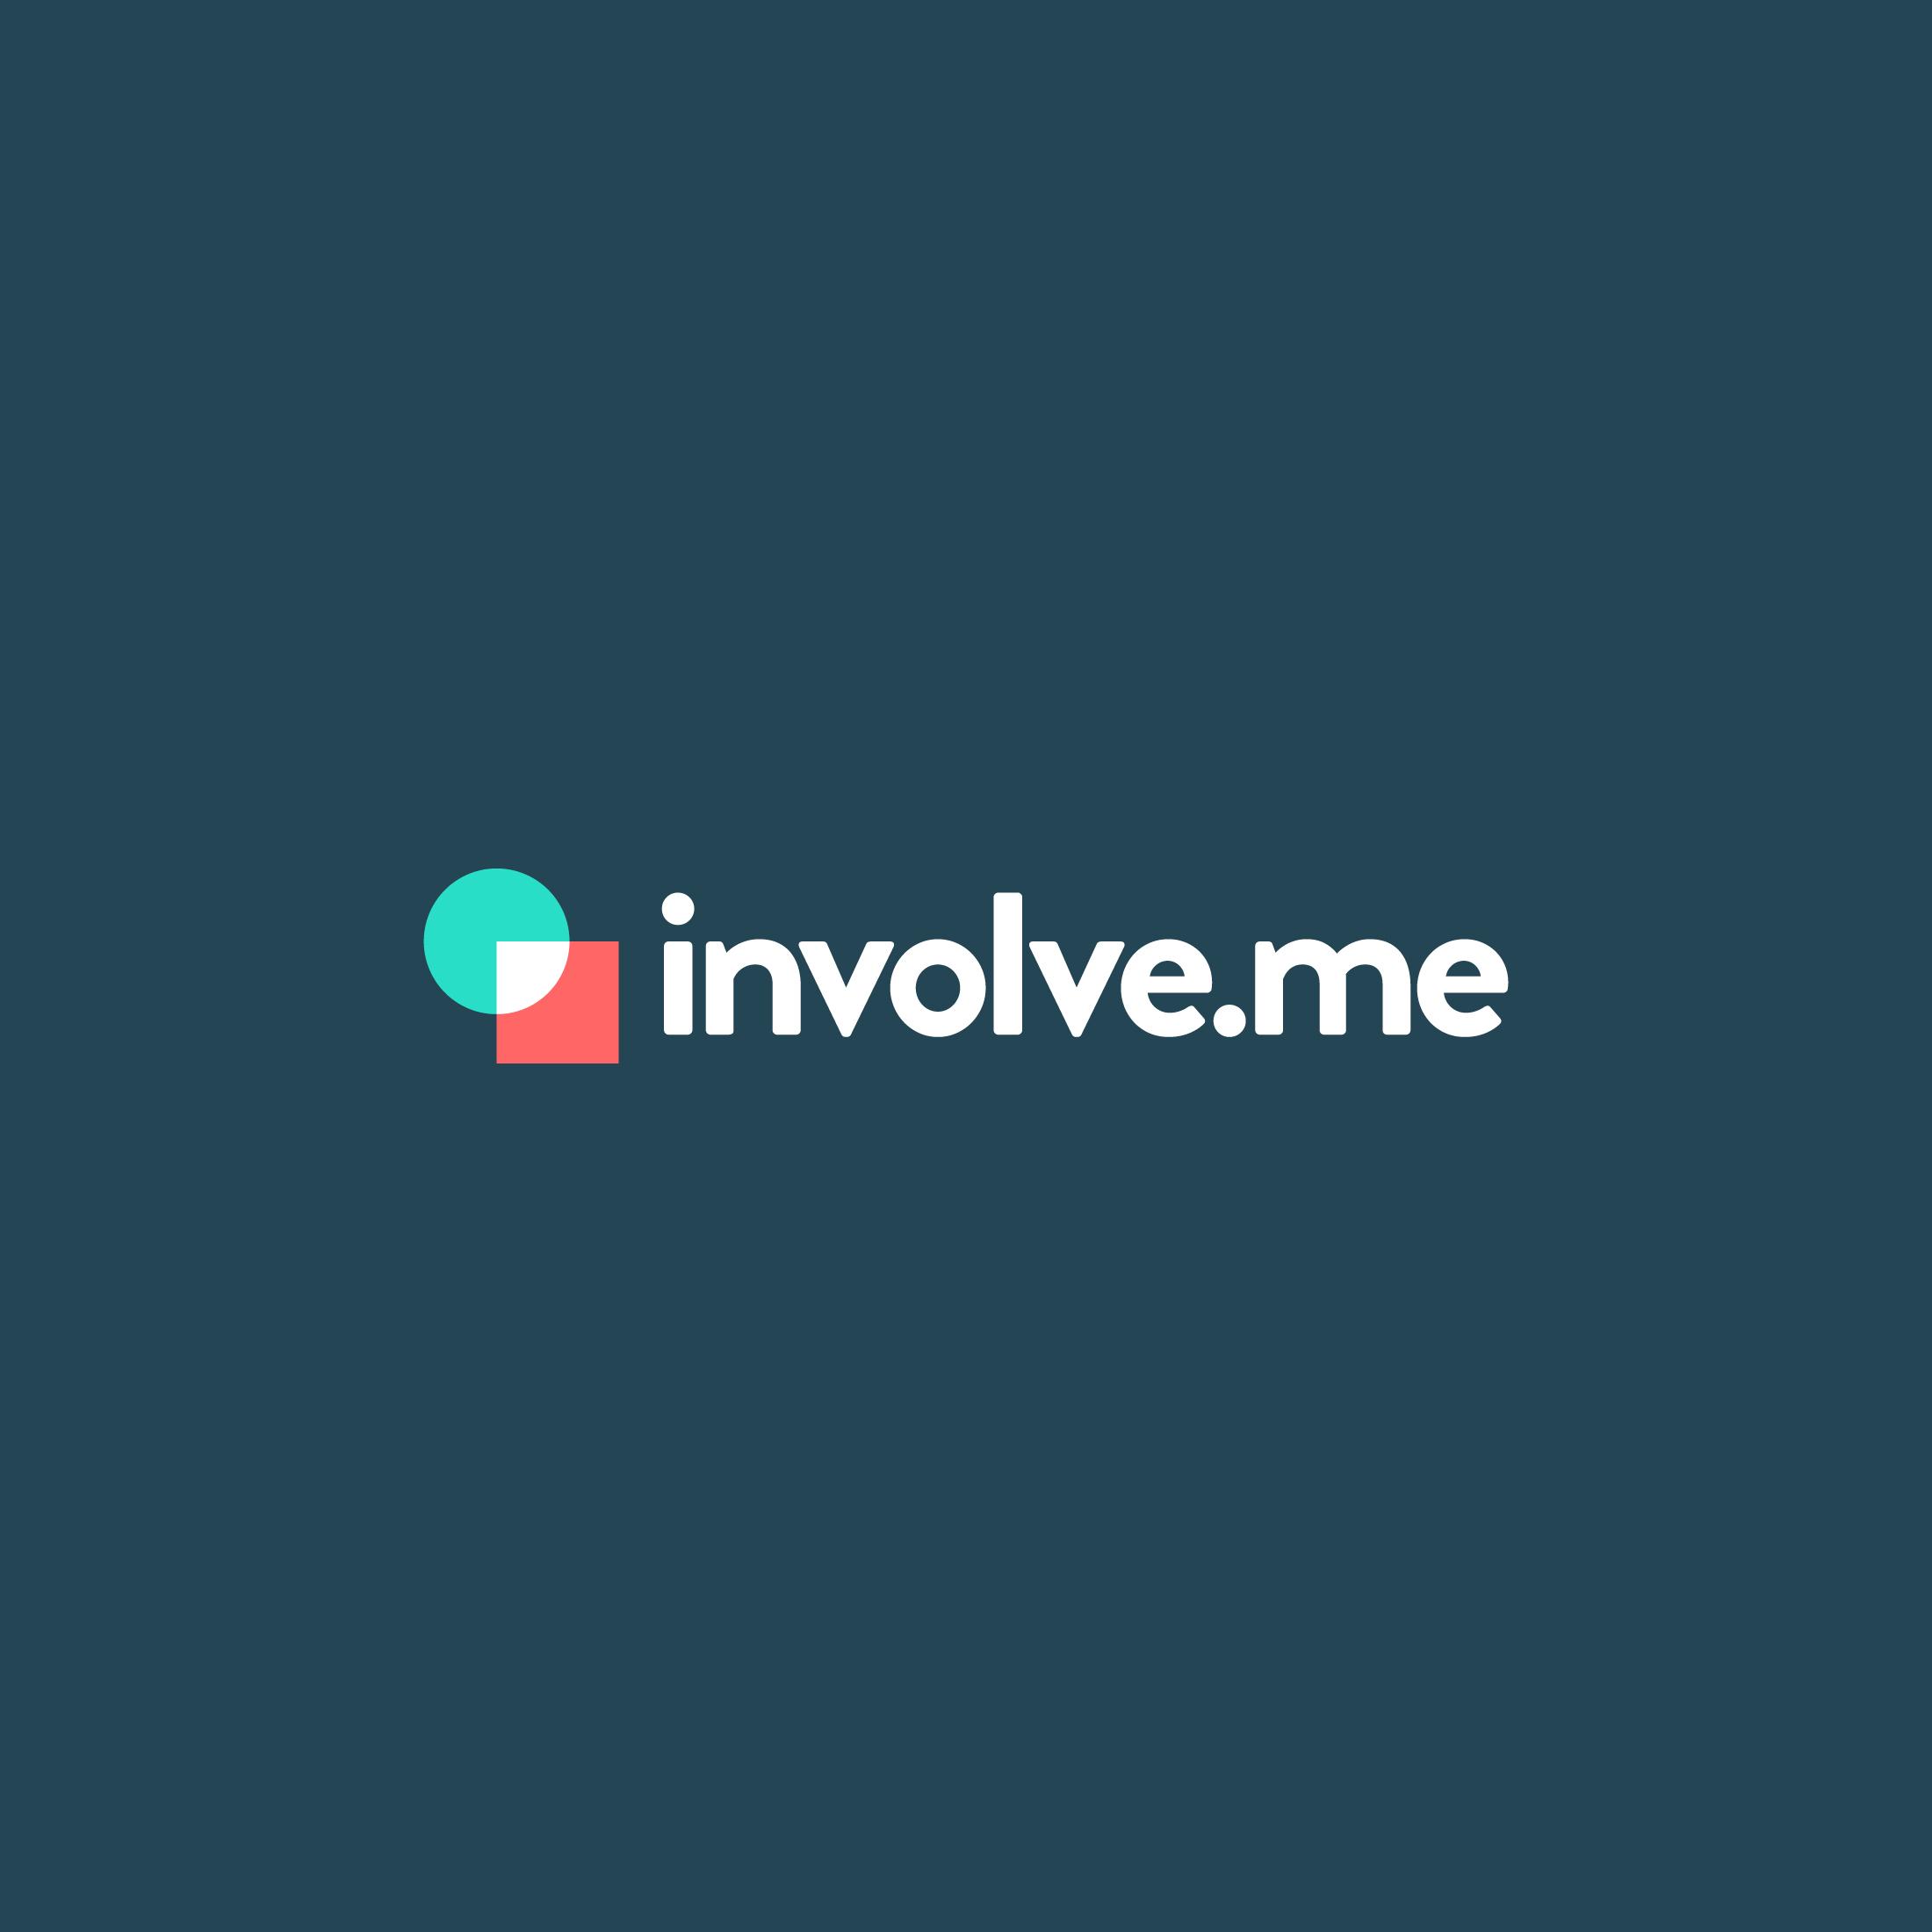 involveme